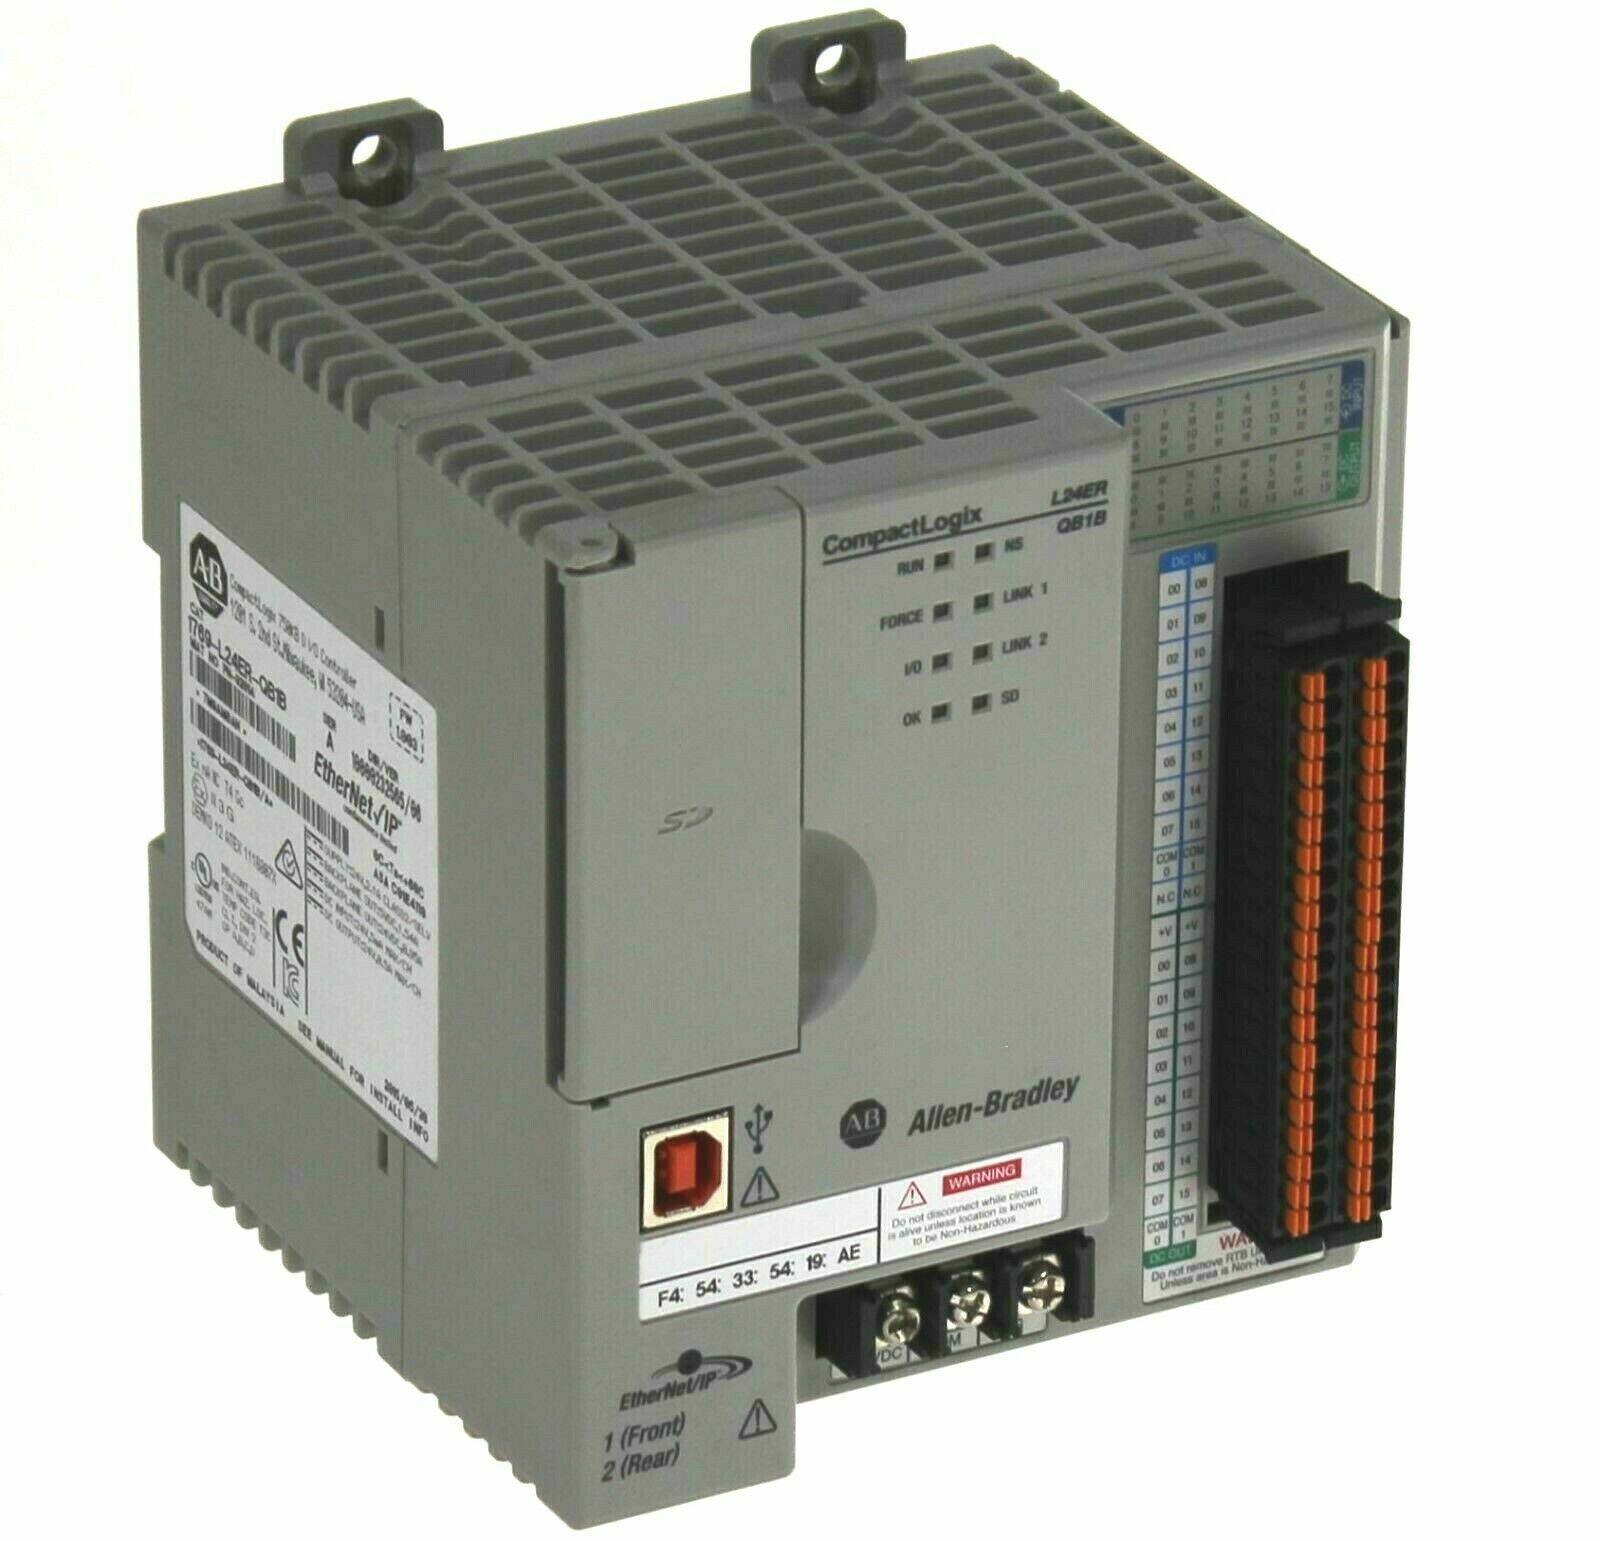 Allen-Bradley 1769-L24ER-QB1B Processor/Controller